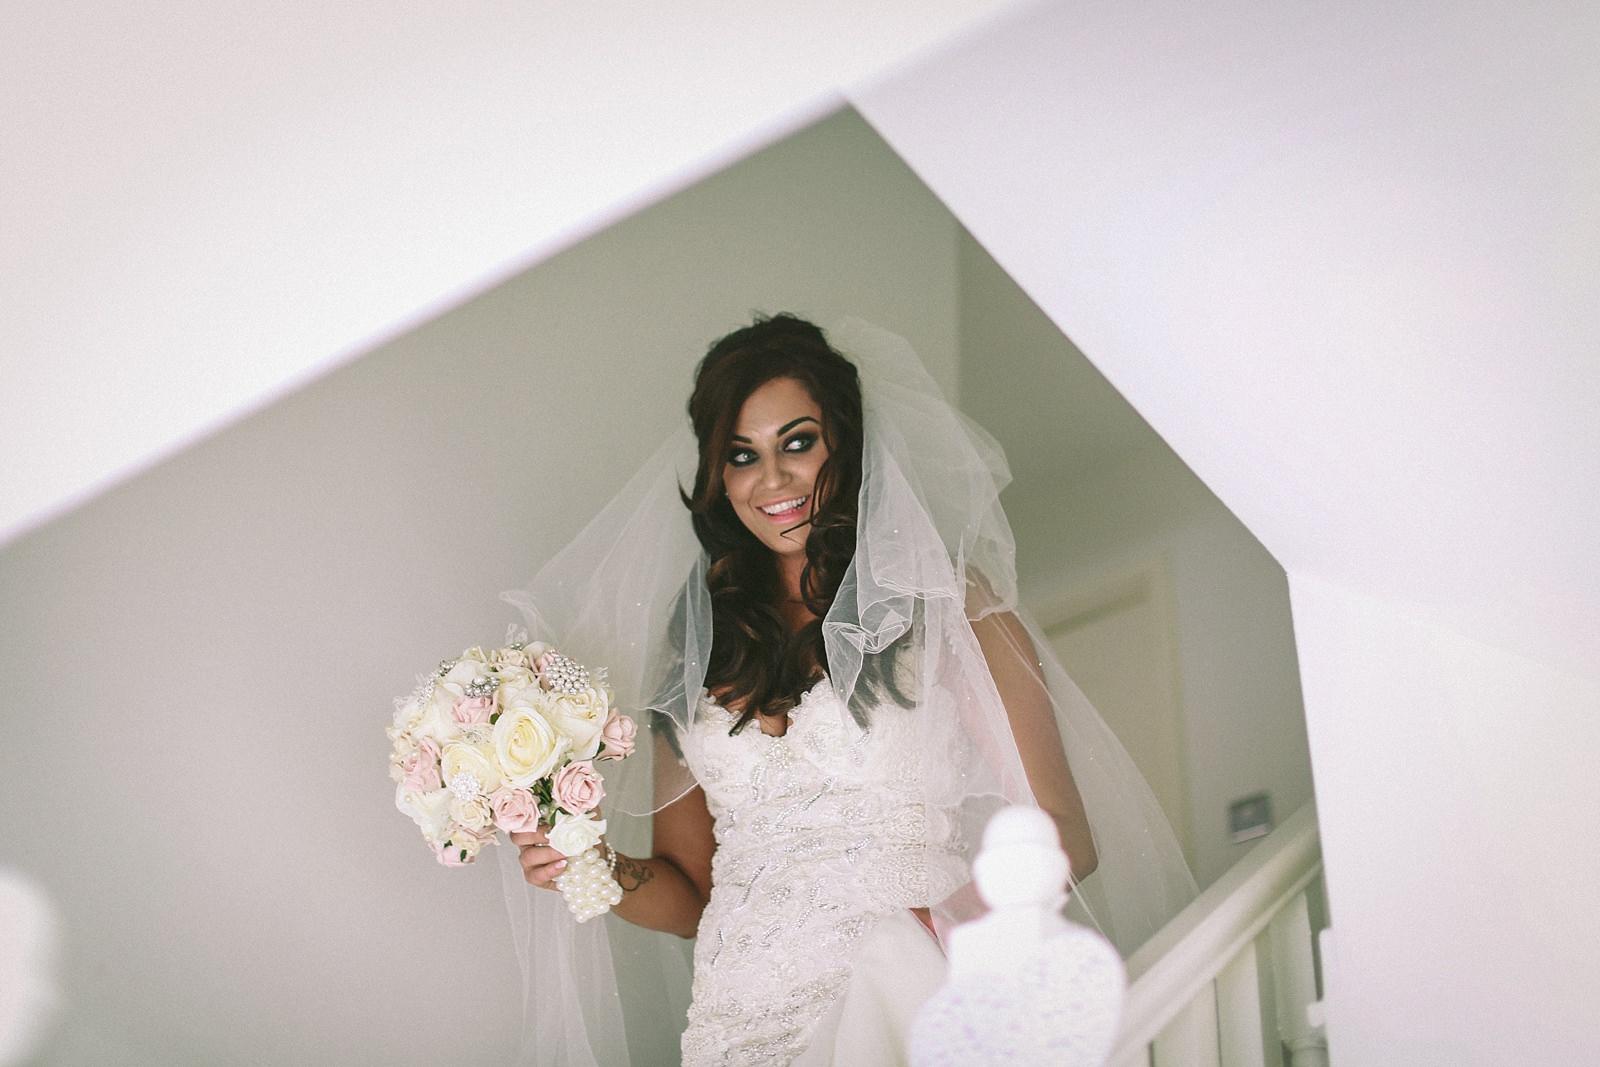 Galia lahav haute couture Giselle dress - West Tower Wedding Photography by Lancashire wedding Photographer Wes Simpson_0011